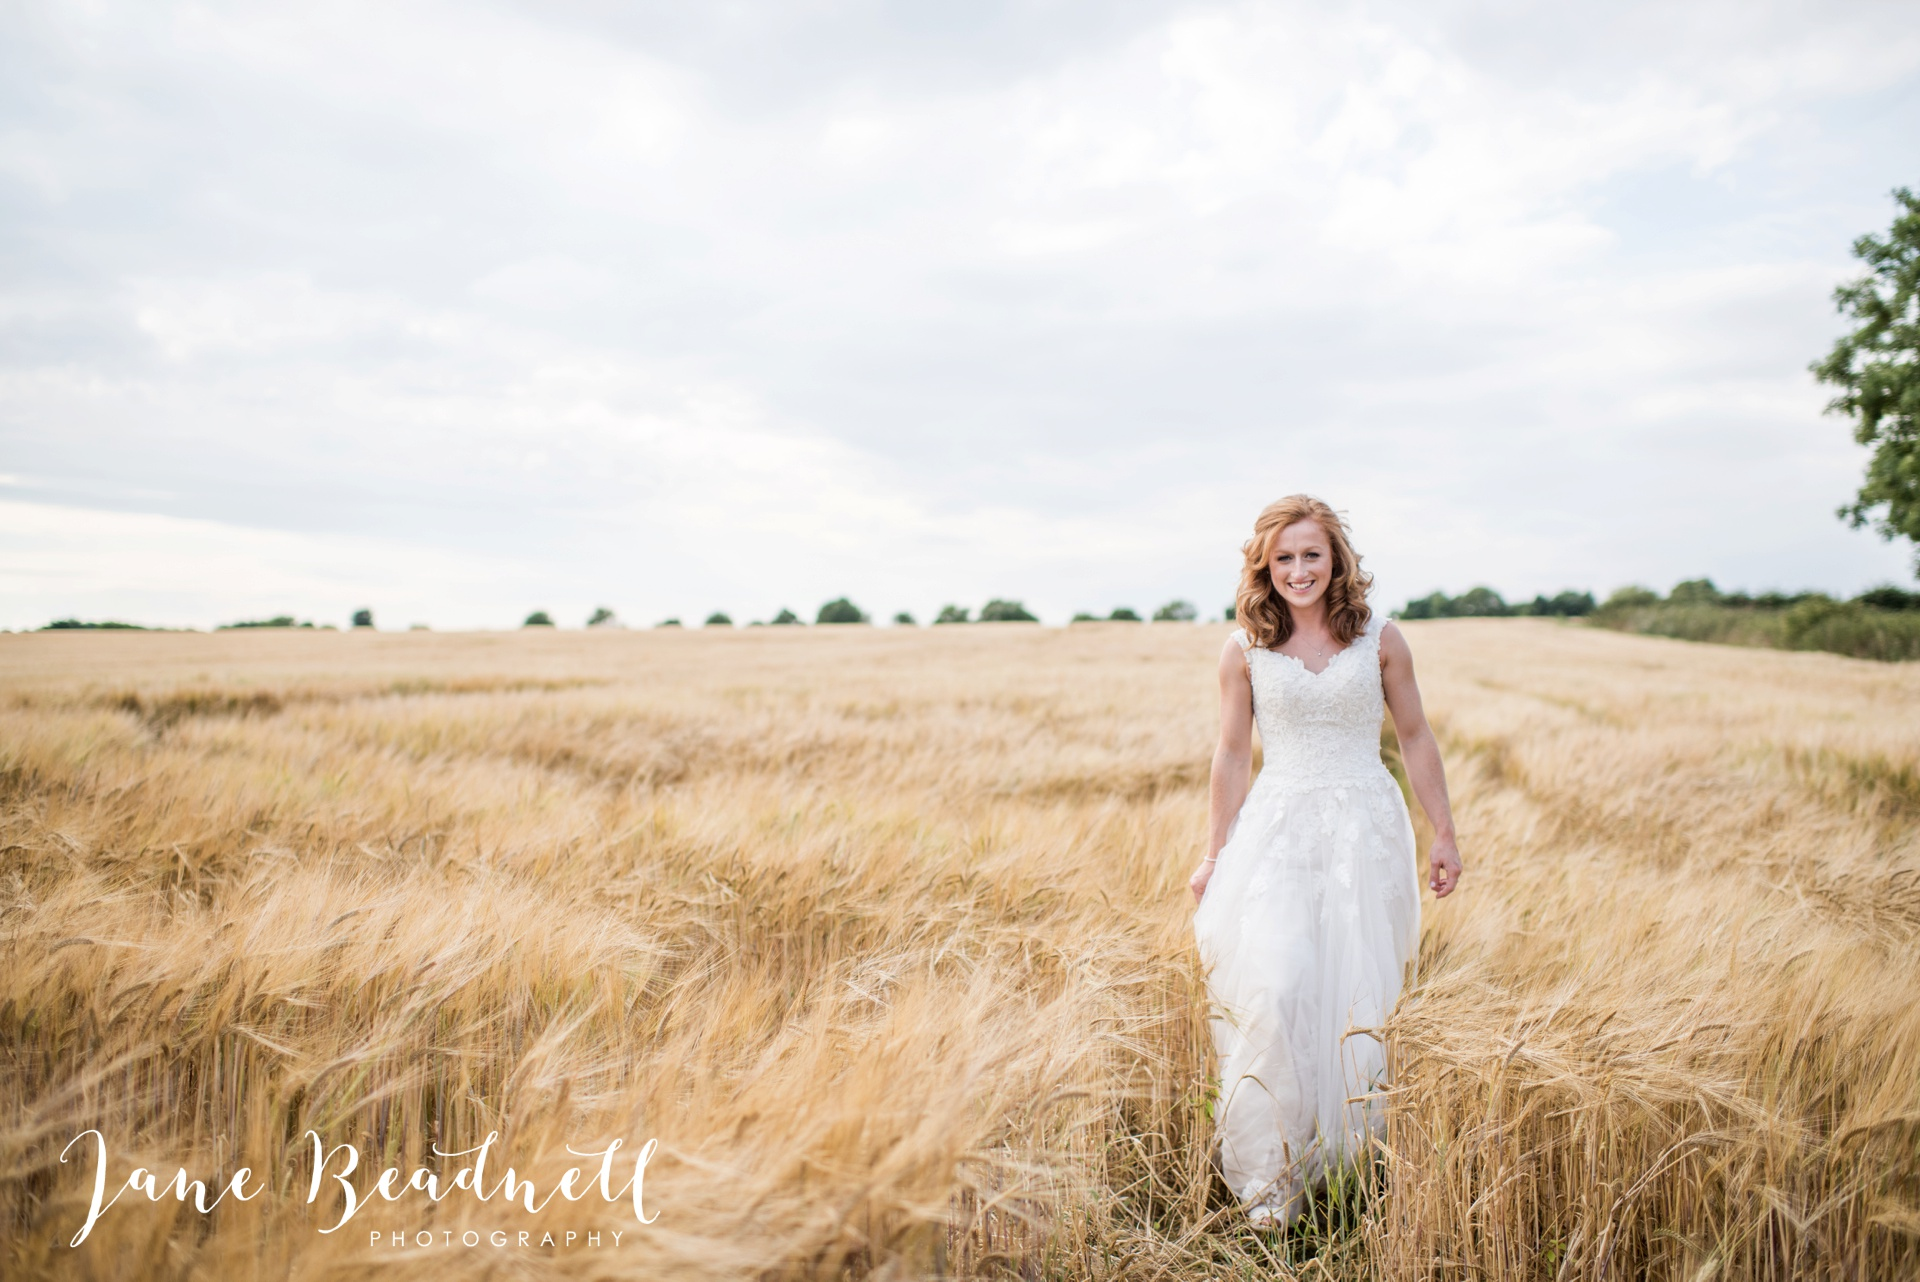 yorkshire-fine-art-wedding-photographer-jane-beadnell-photography-poppleton-york_0121